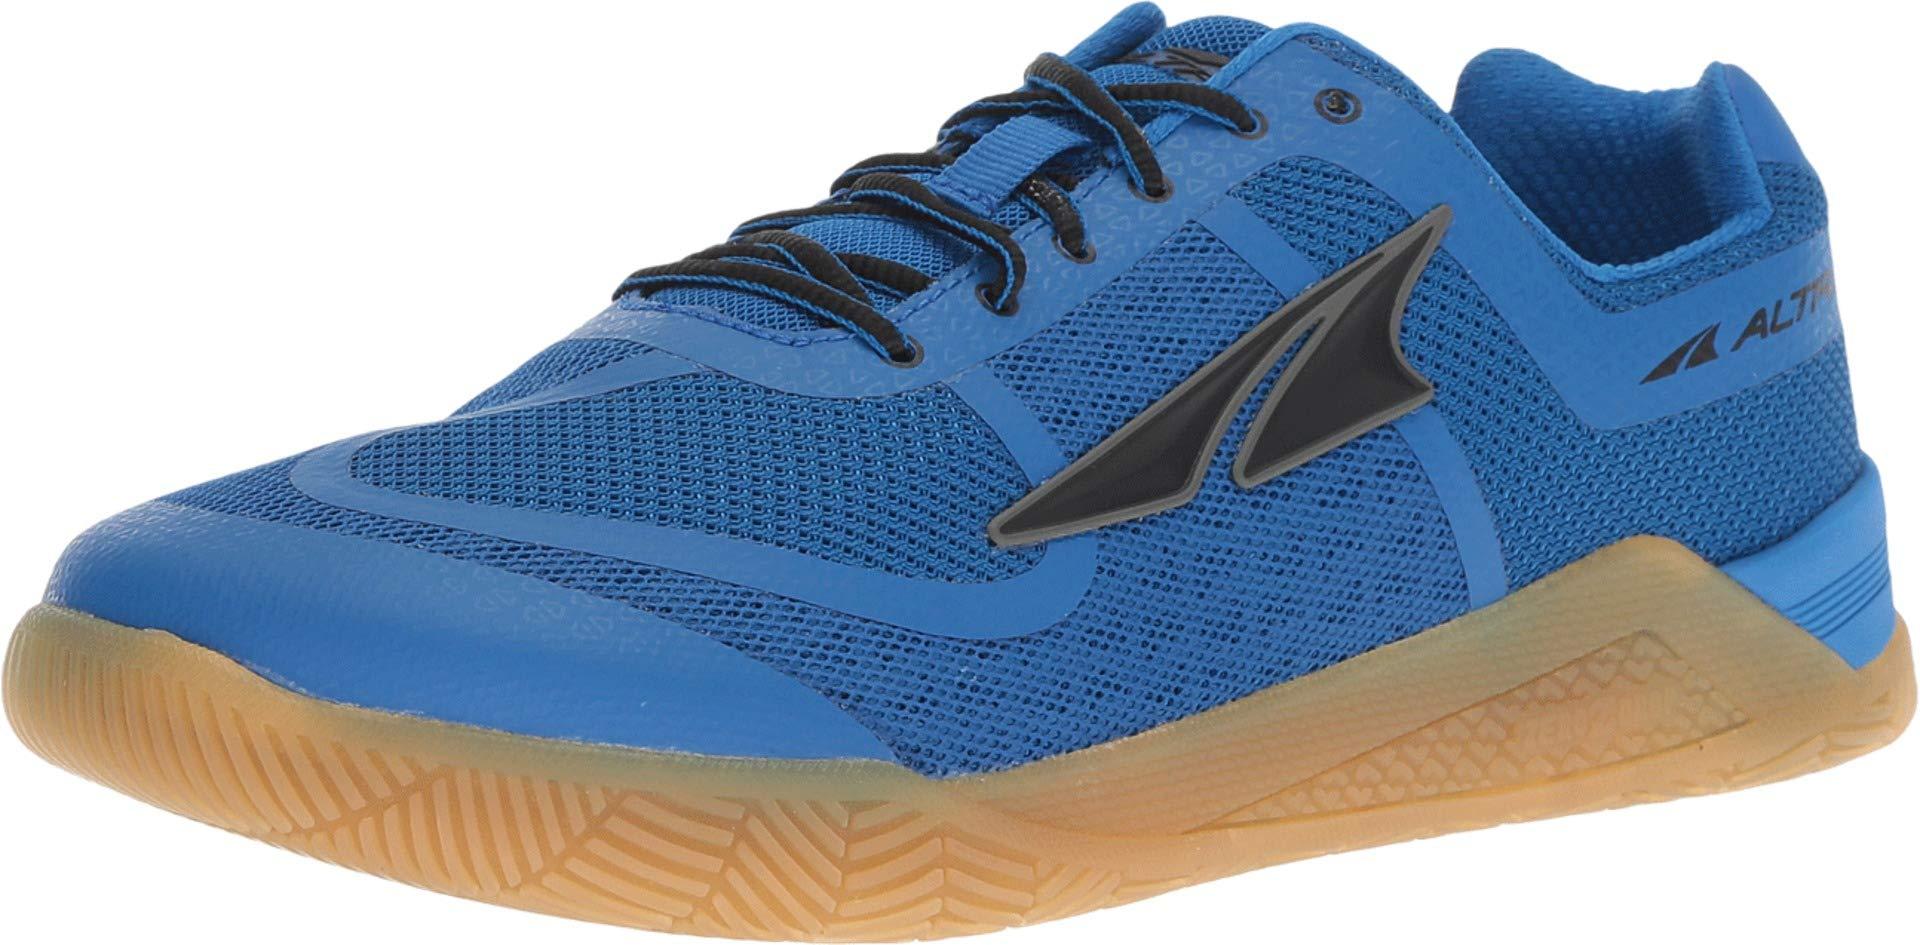 Altra Footwear Men's HIIT XT 1.5 Blue 12.5 D US by Altra